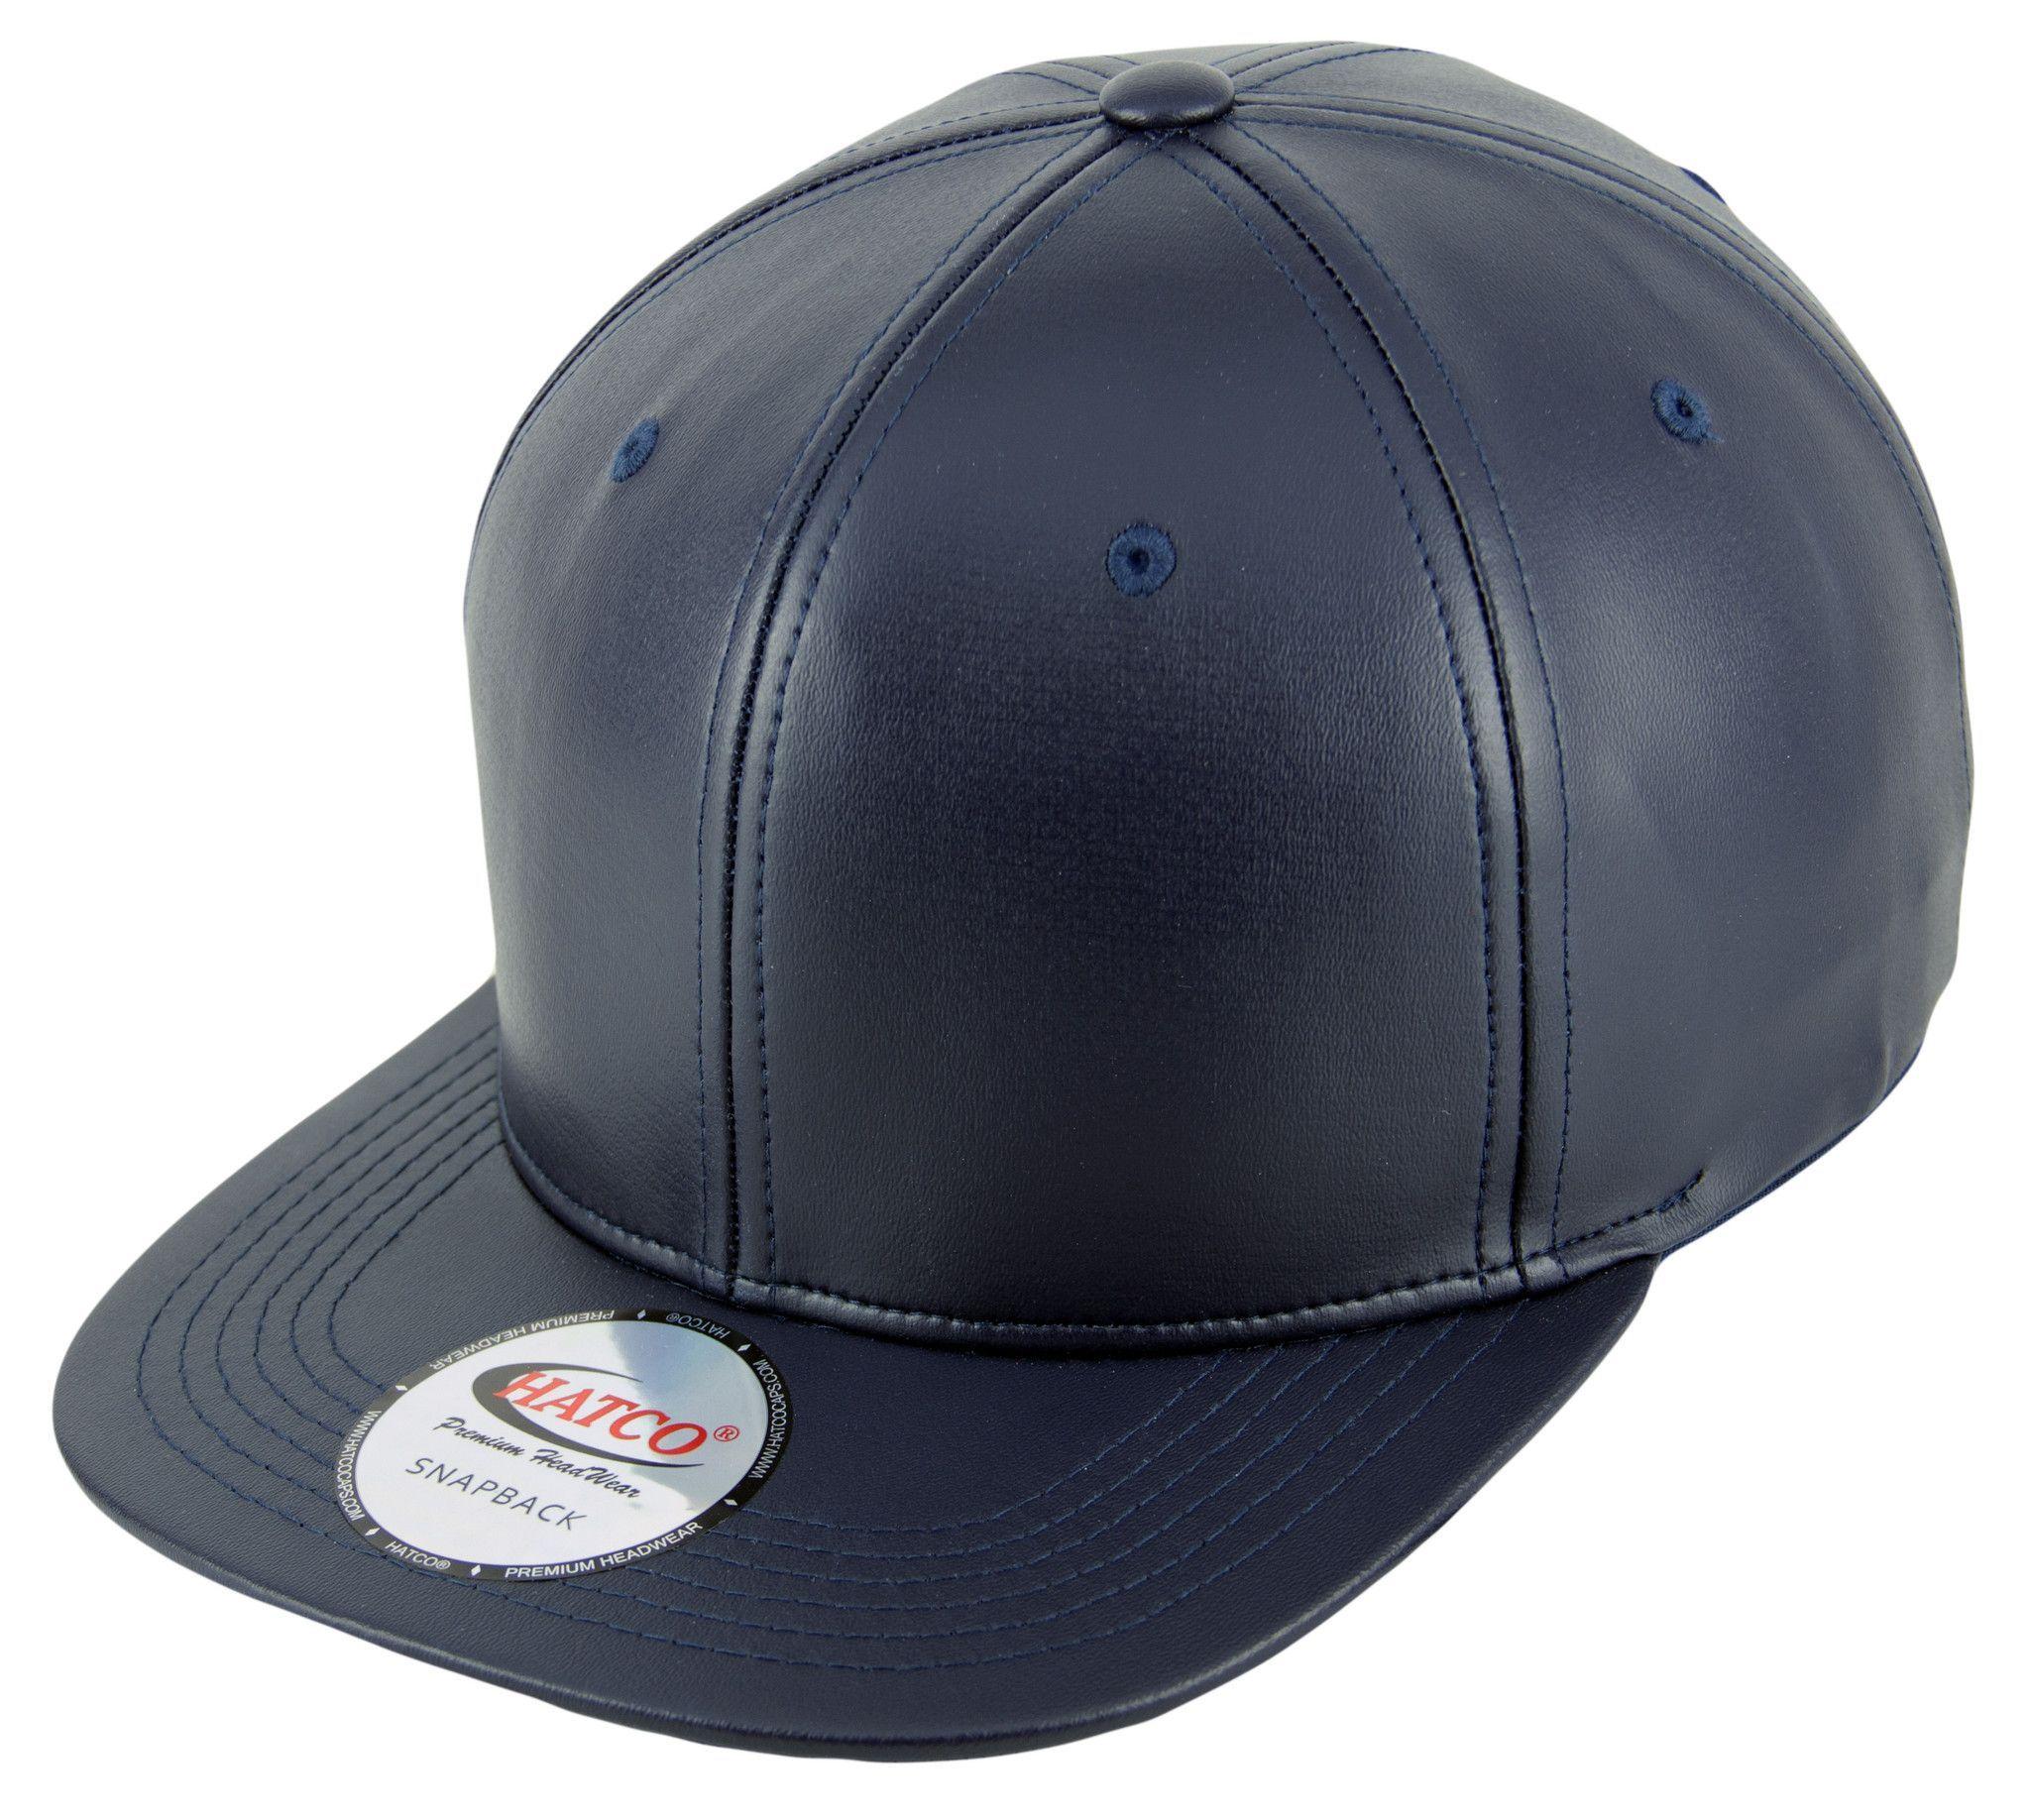 c0820579847 Blank Acrylic Two-Tone Snapback Cap - Kelly Green Black